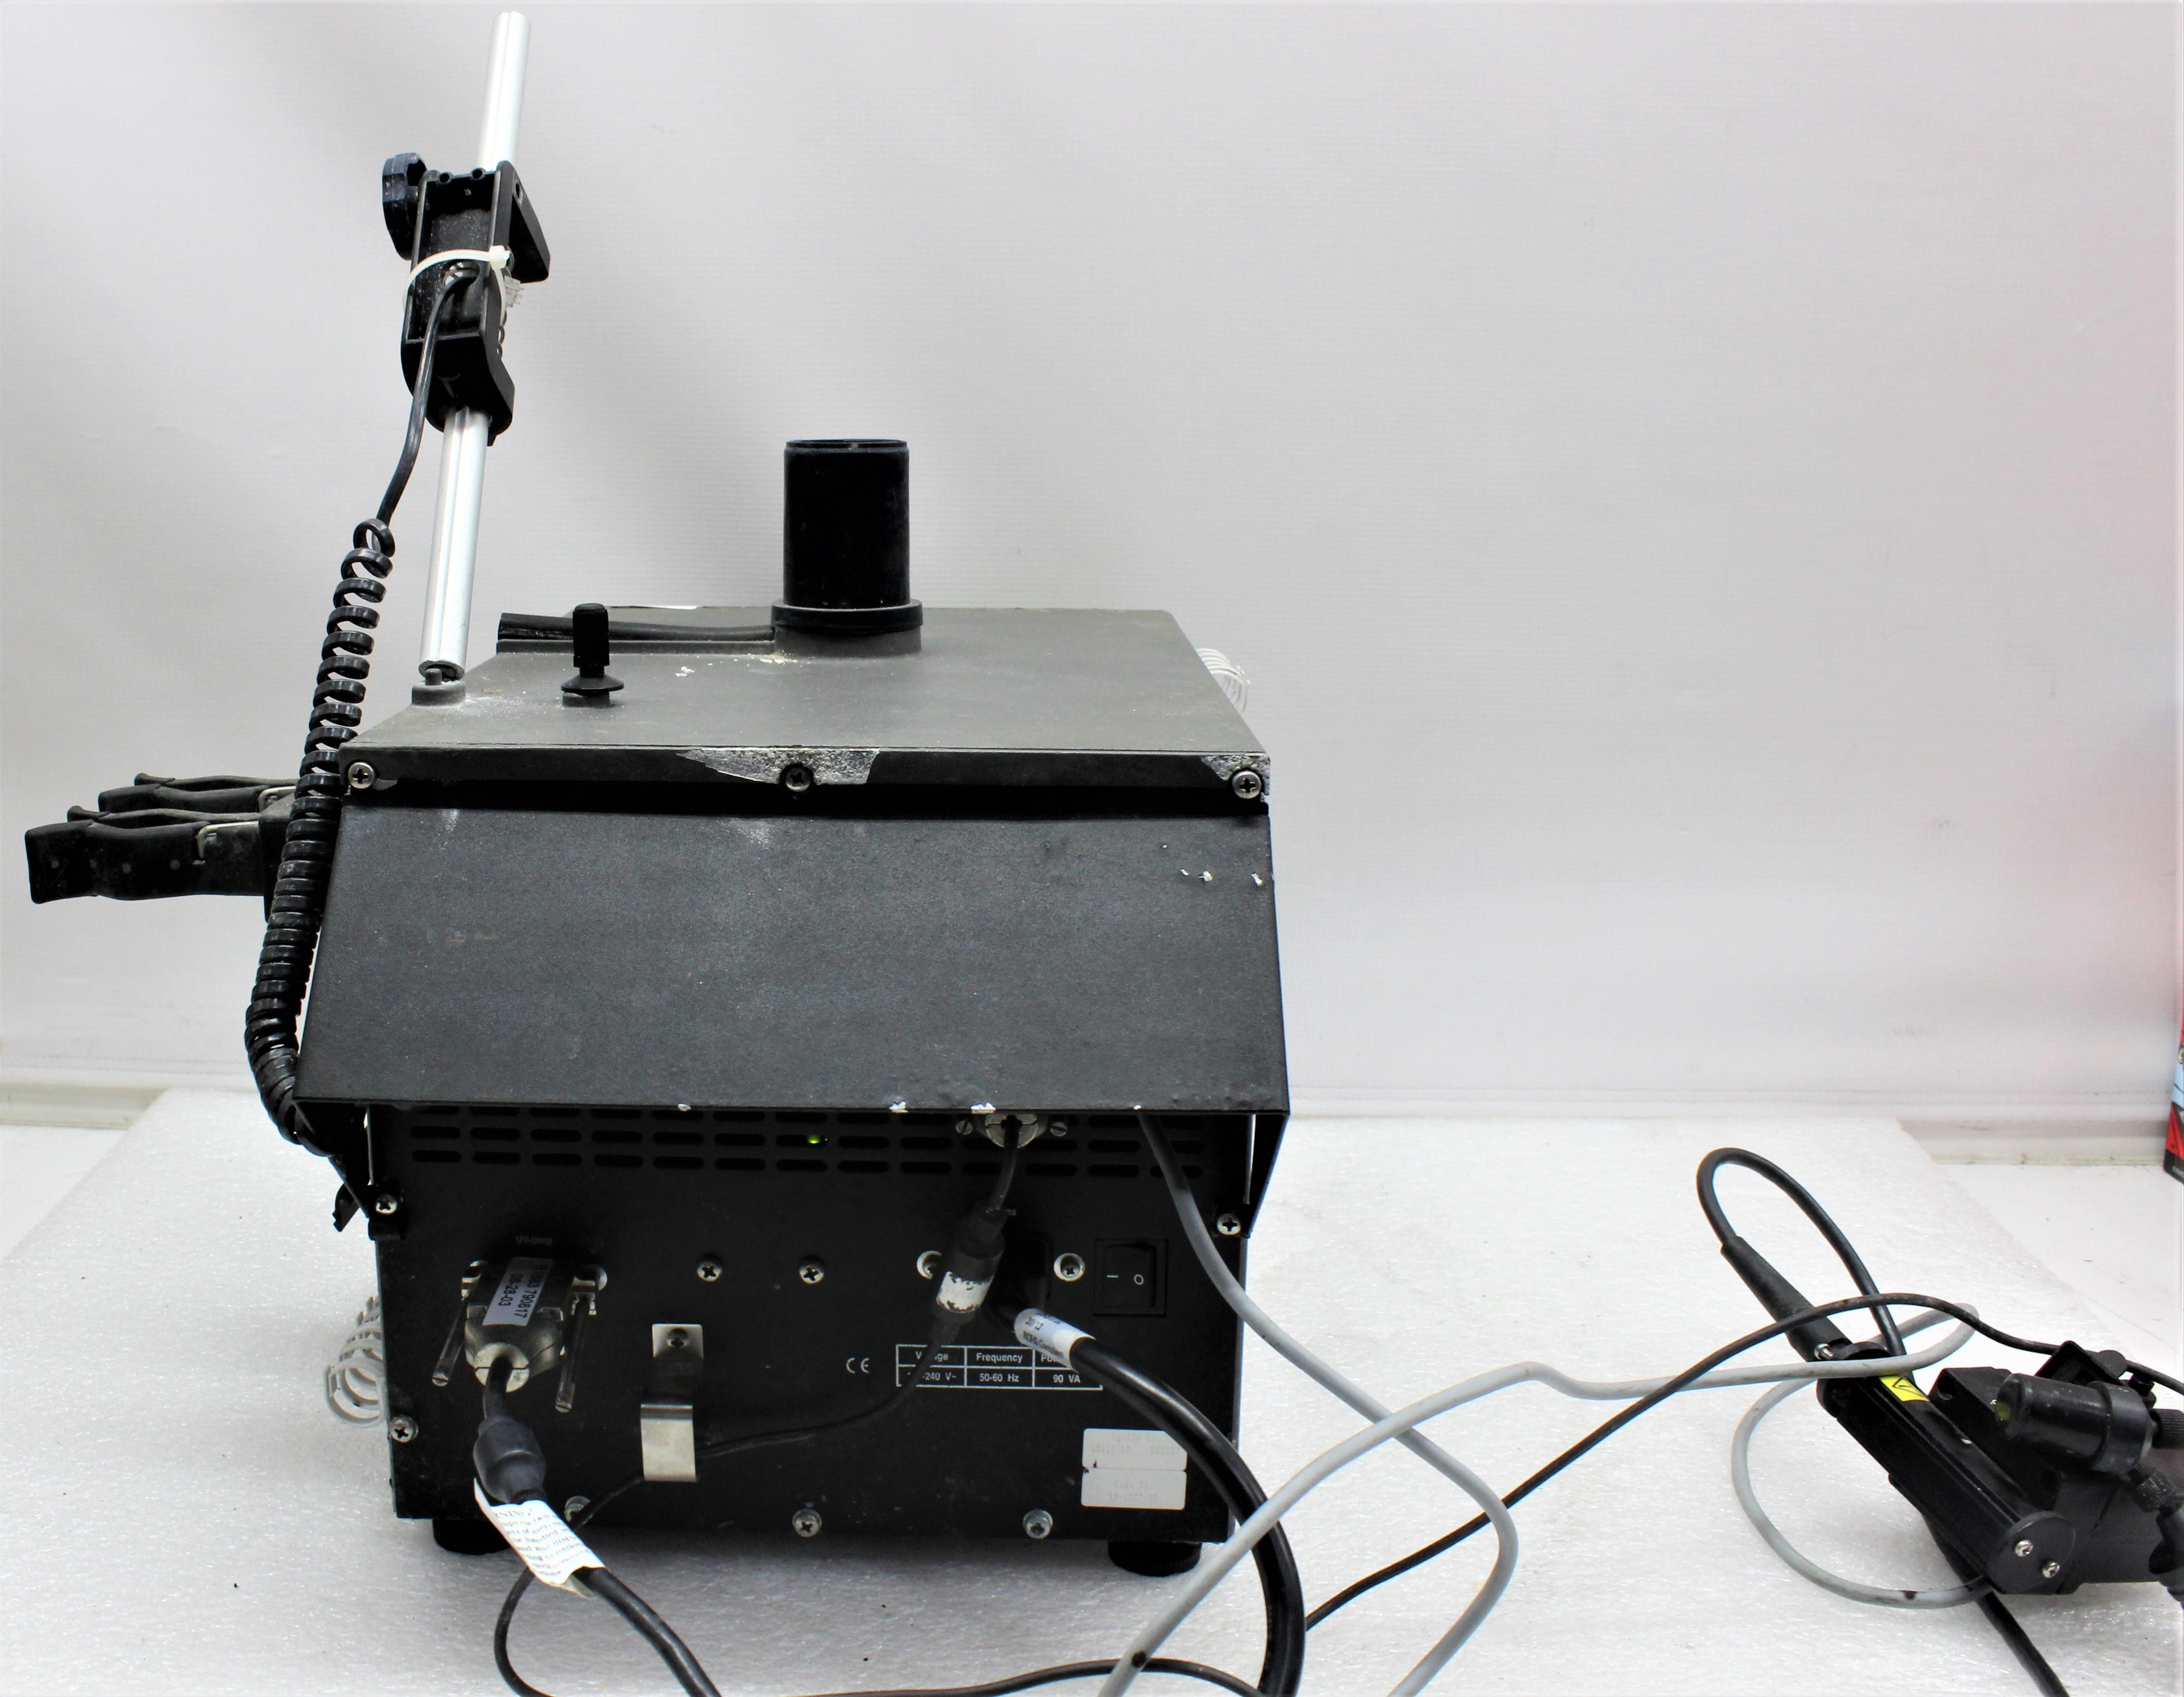 Image GE AKTA Prime Liquid Chromatography System 1587126